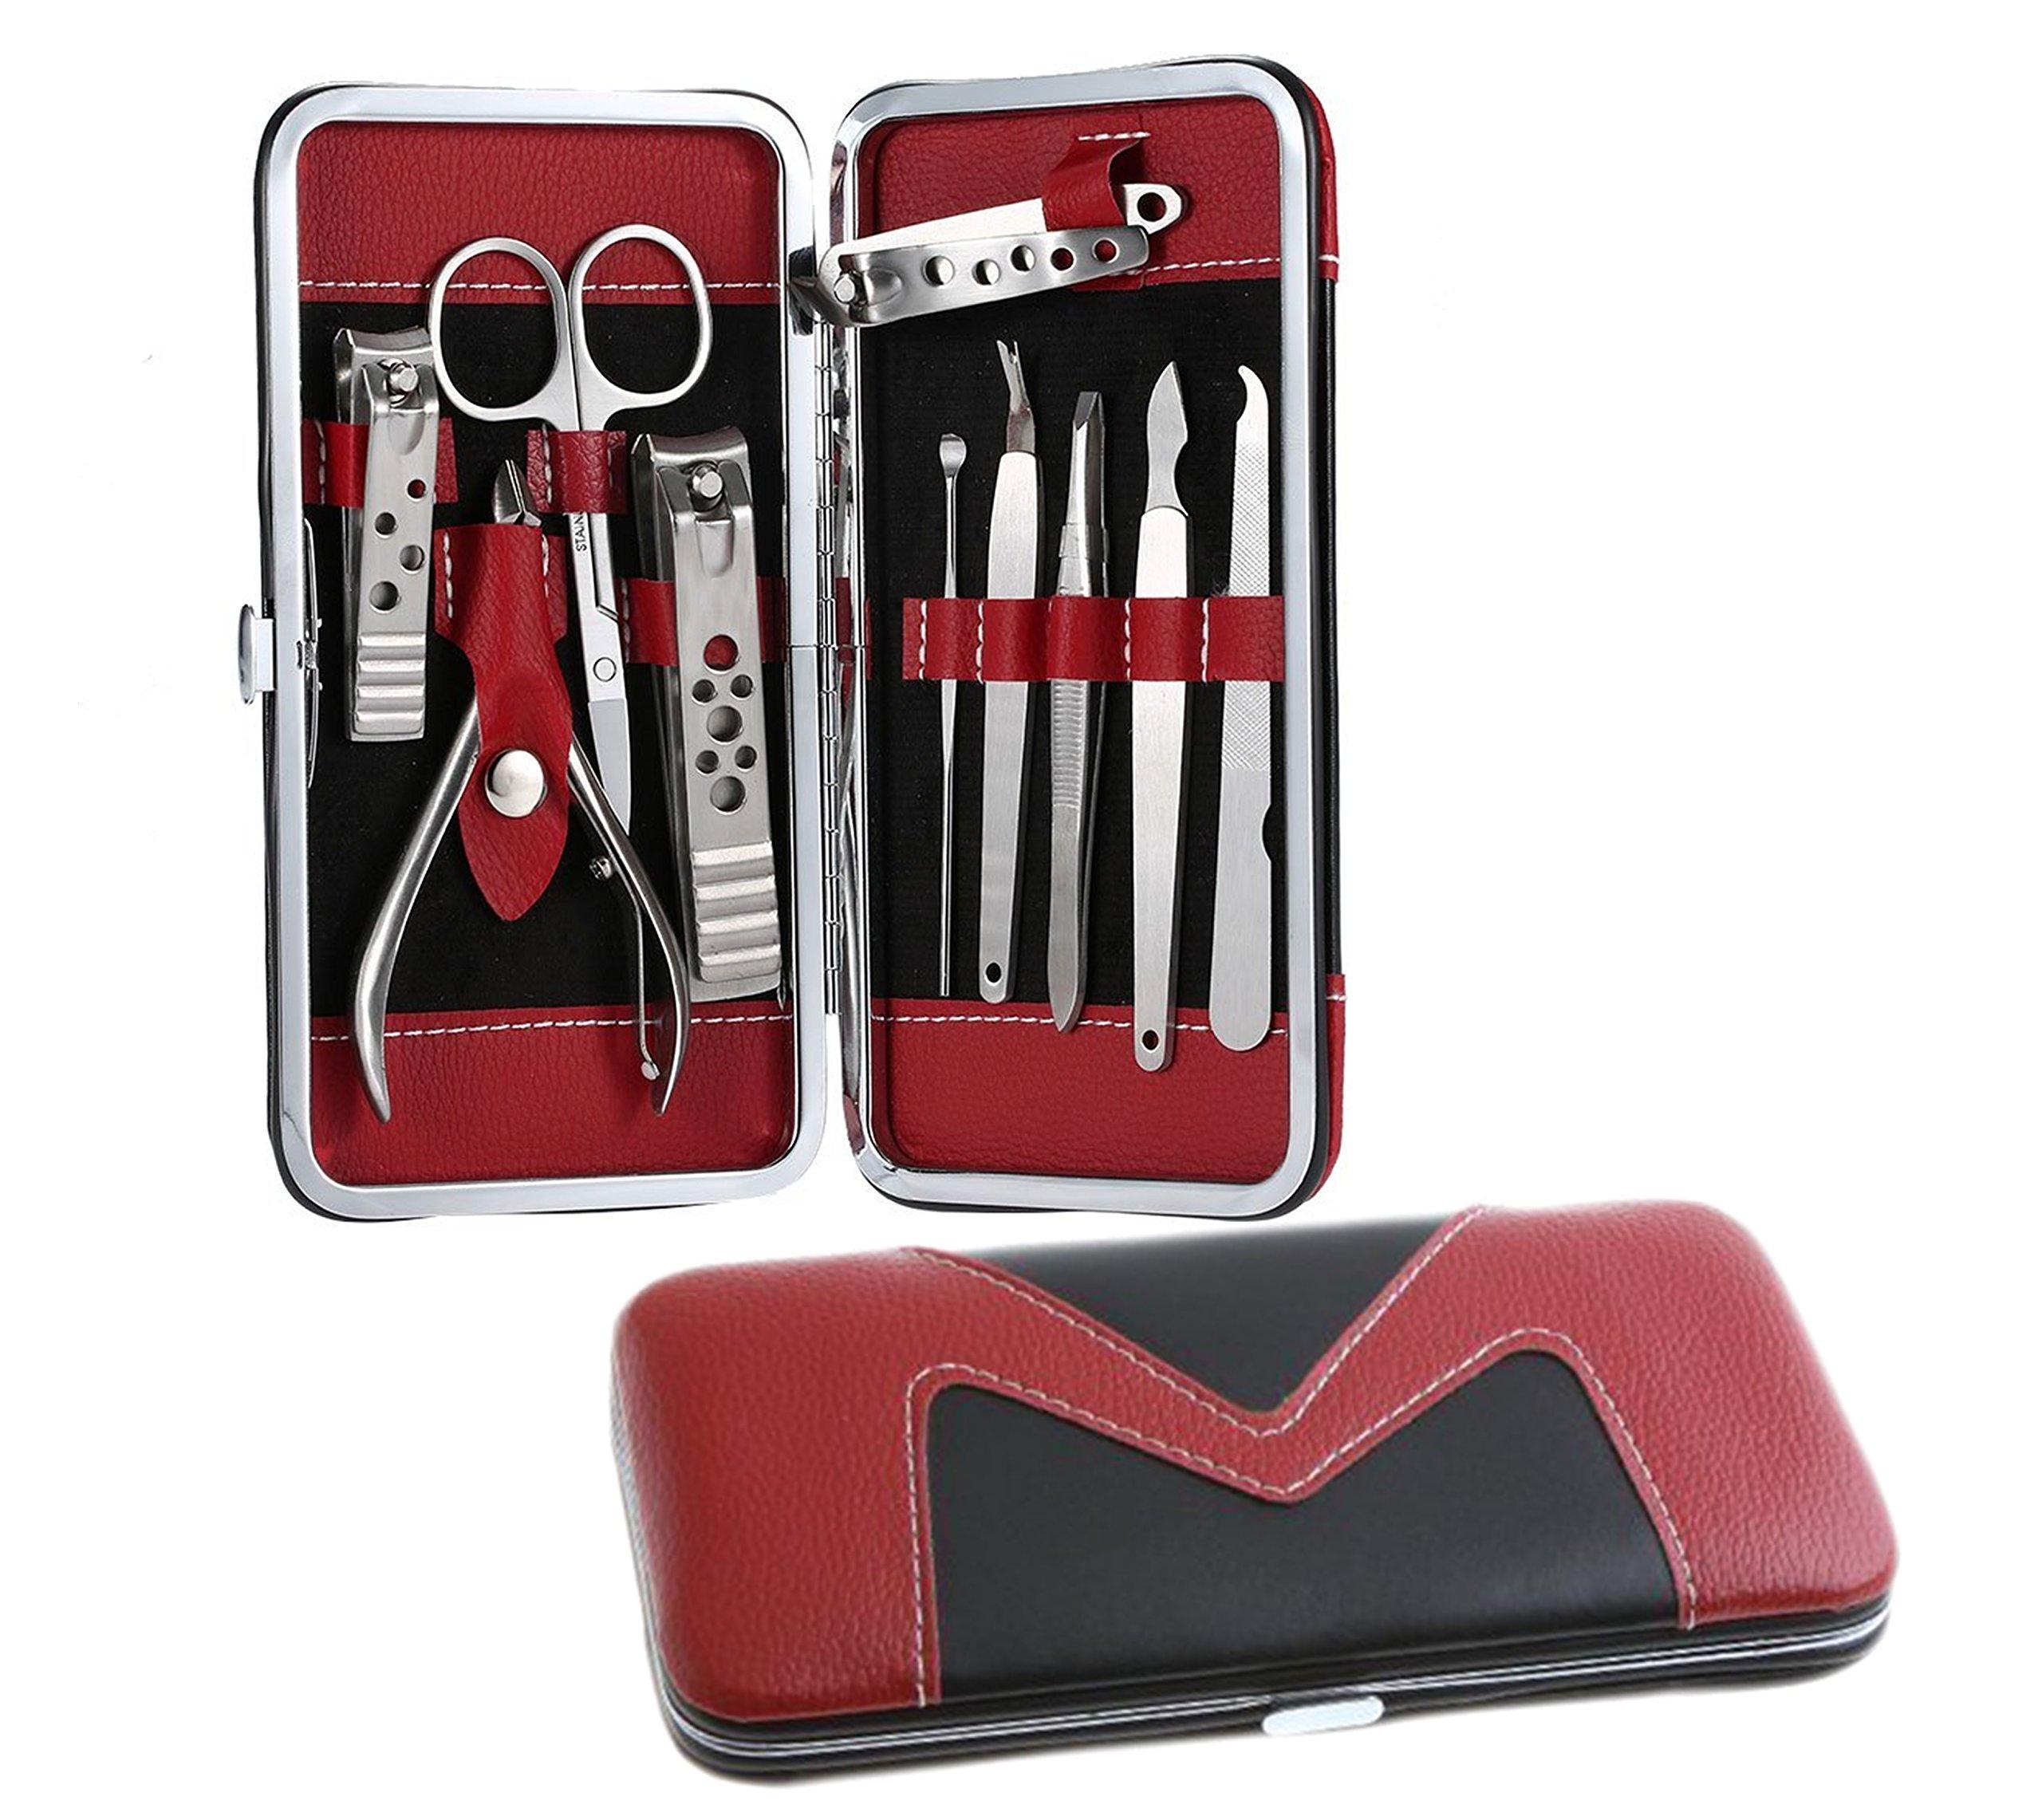 Amazon.com: 1 Set Pedicure / Manicure Set Nail Clippers Cleaner ...